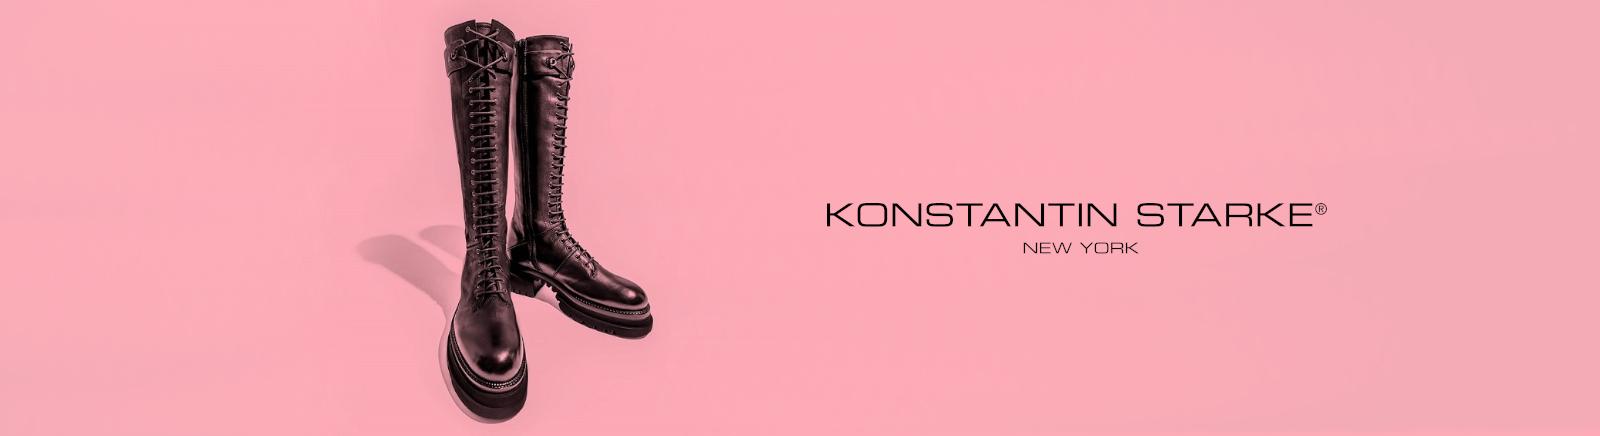 Gisy: Konstantin Starke Slingpumps für Damen online shoppen